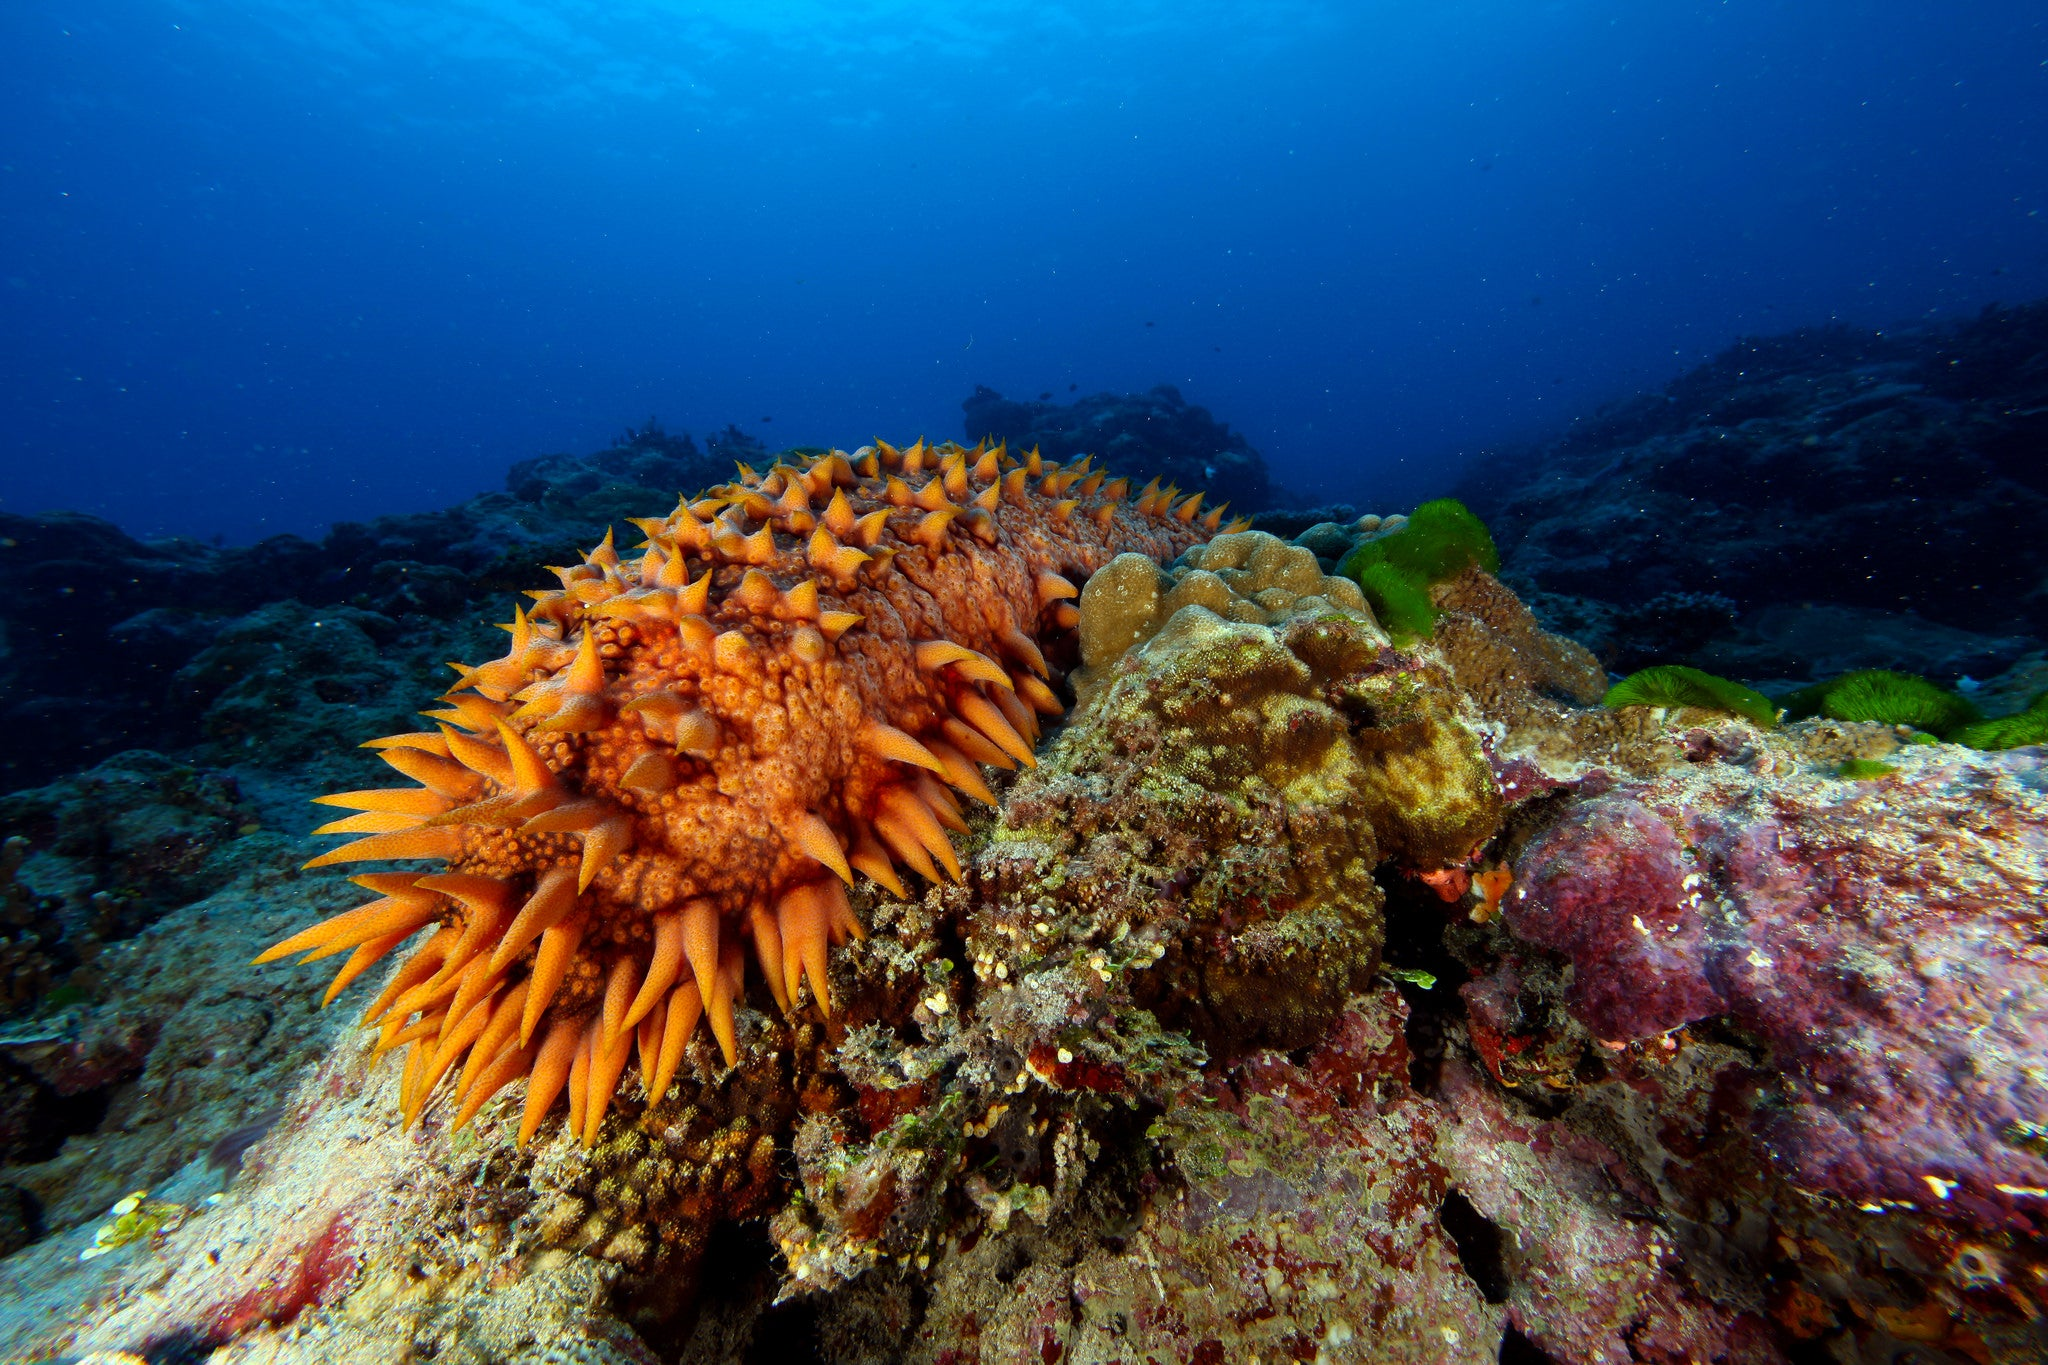 orange spiky sea cucumber in the water